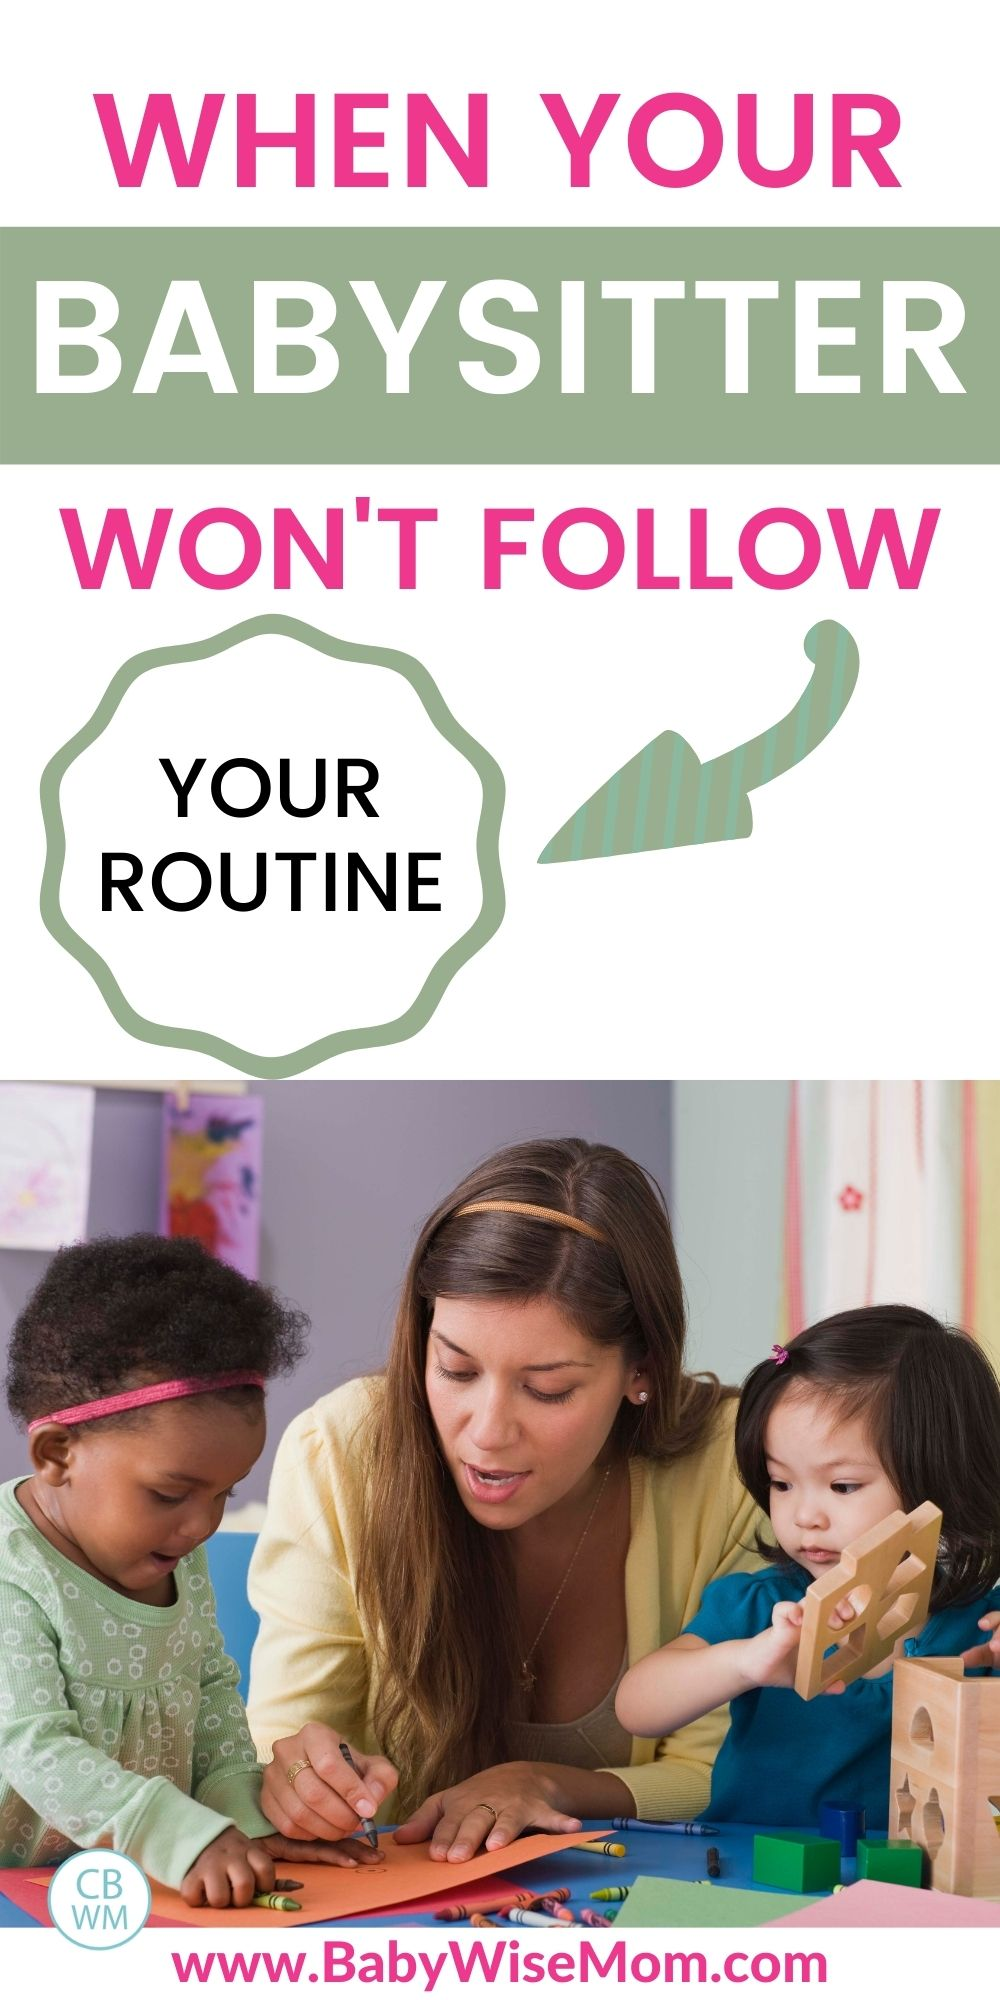 When babysitter won't follow routine pin